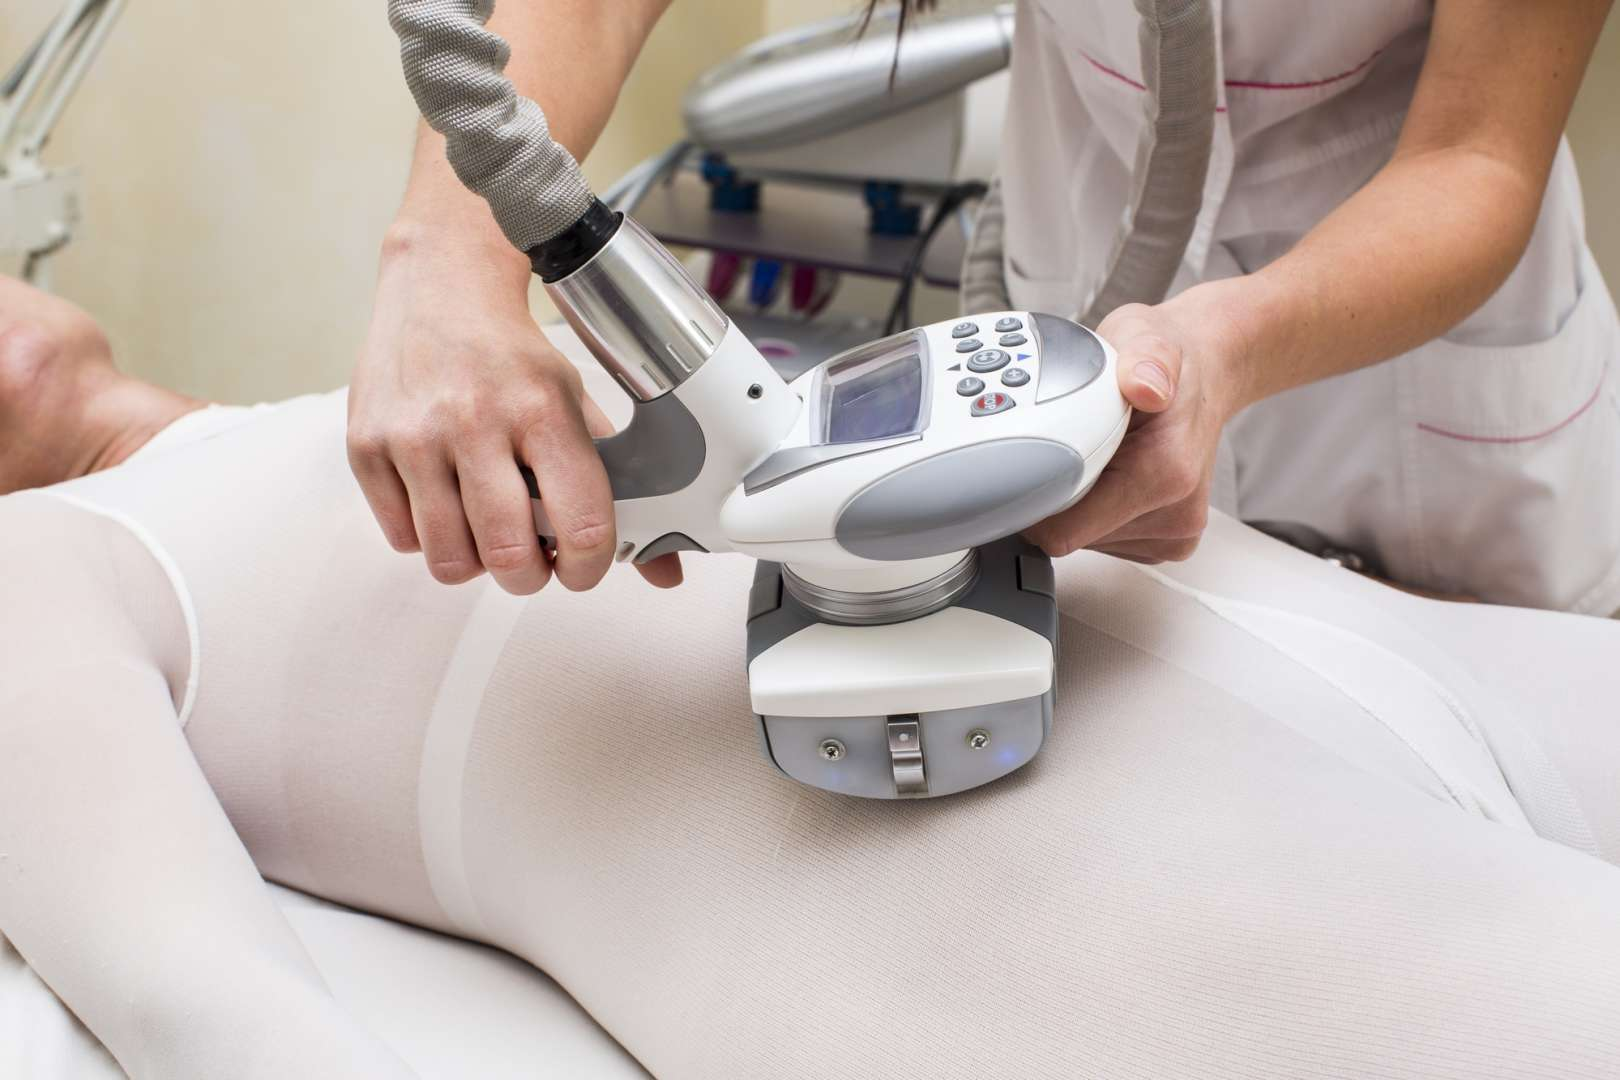 Tratamiento de la celulitis con LPG Endermology